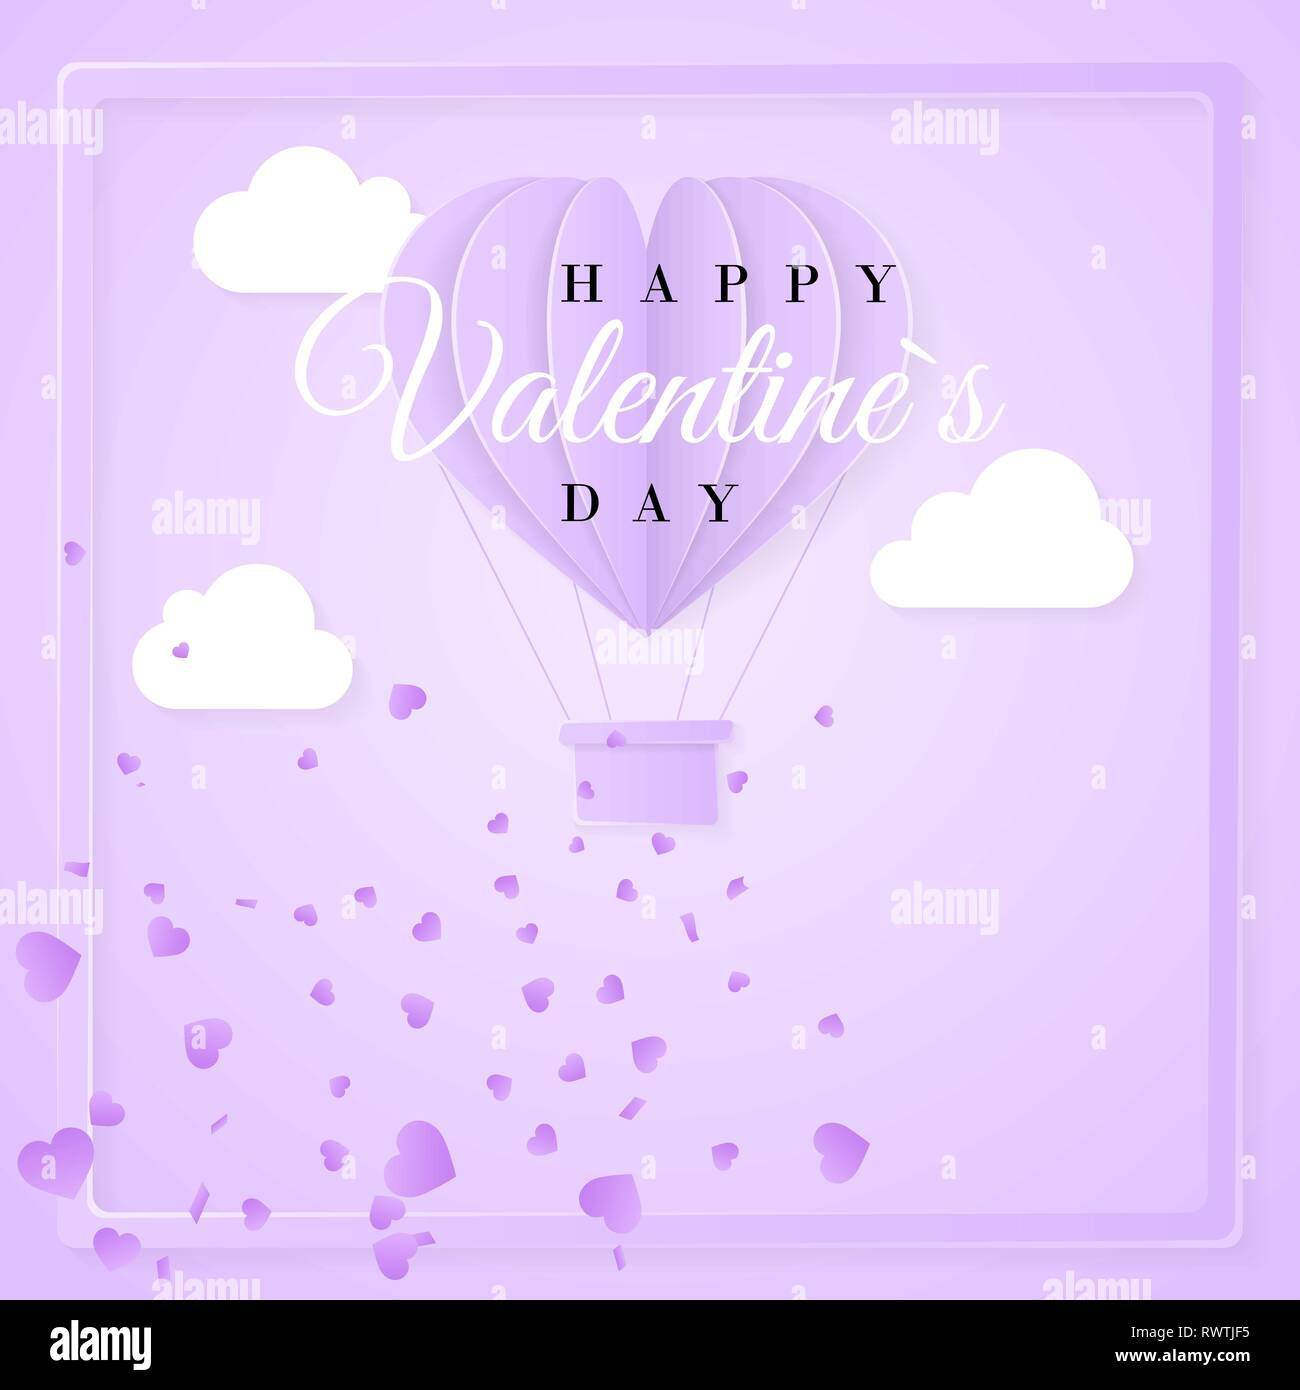 Happy Valentines Day Retro Invitation Card Template With